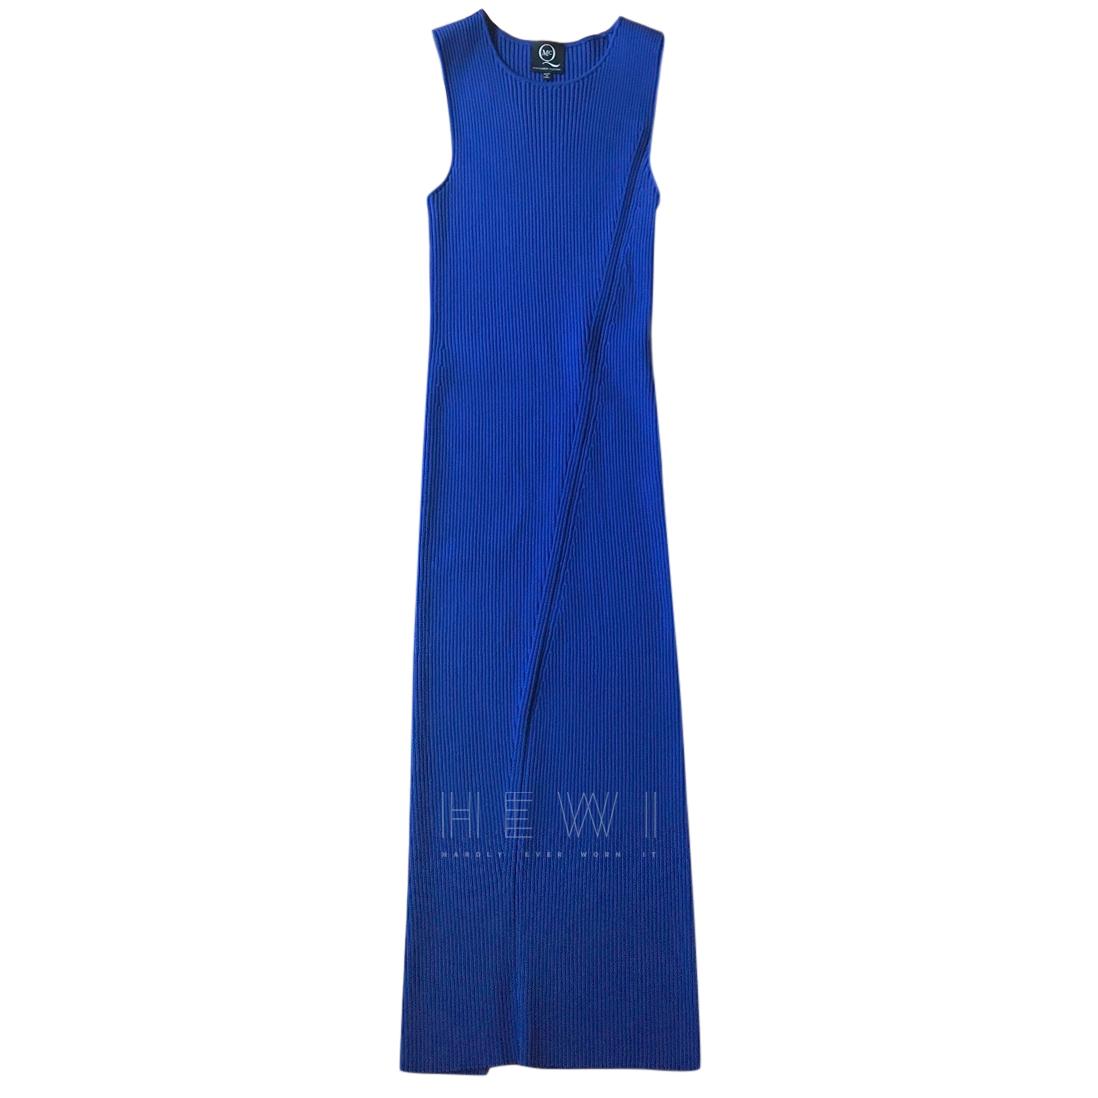 McQ Blue RIbbed Knit Dress